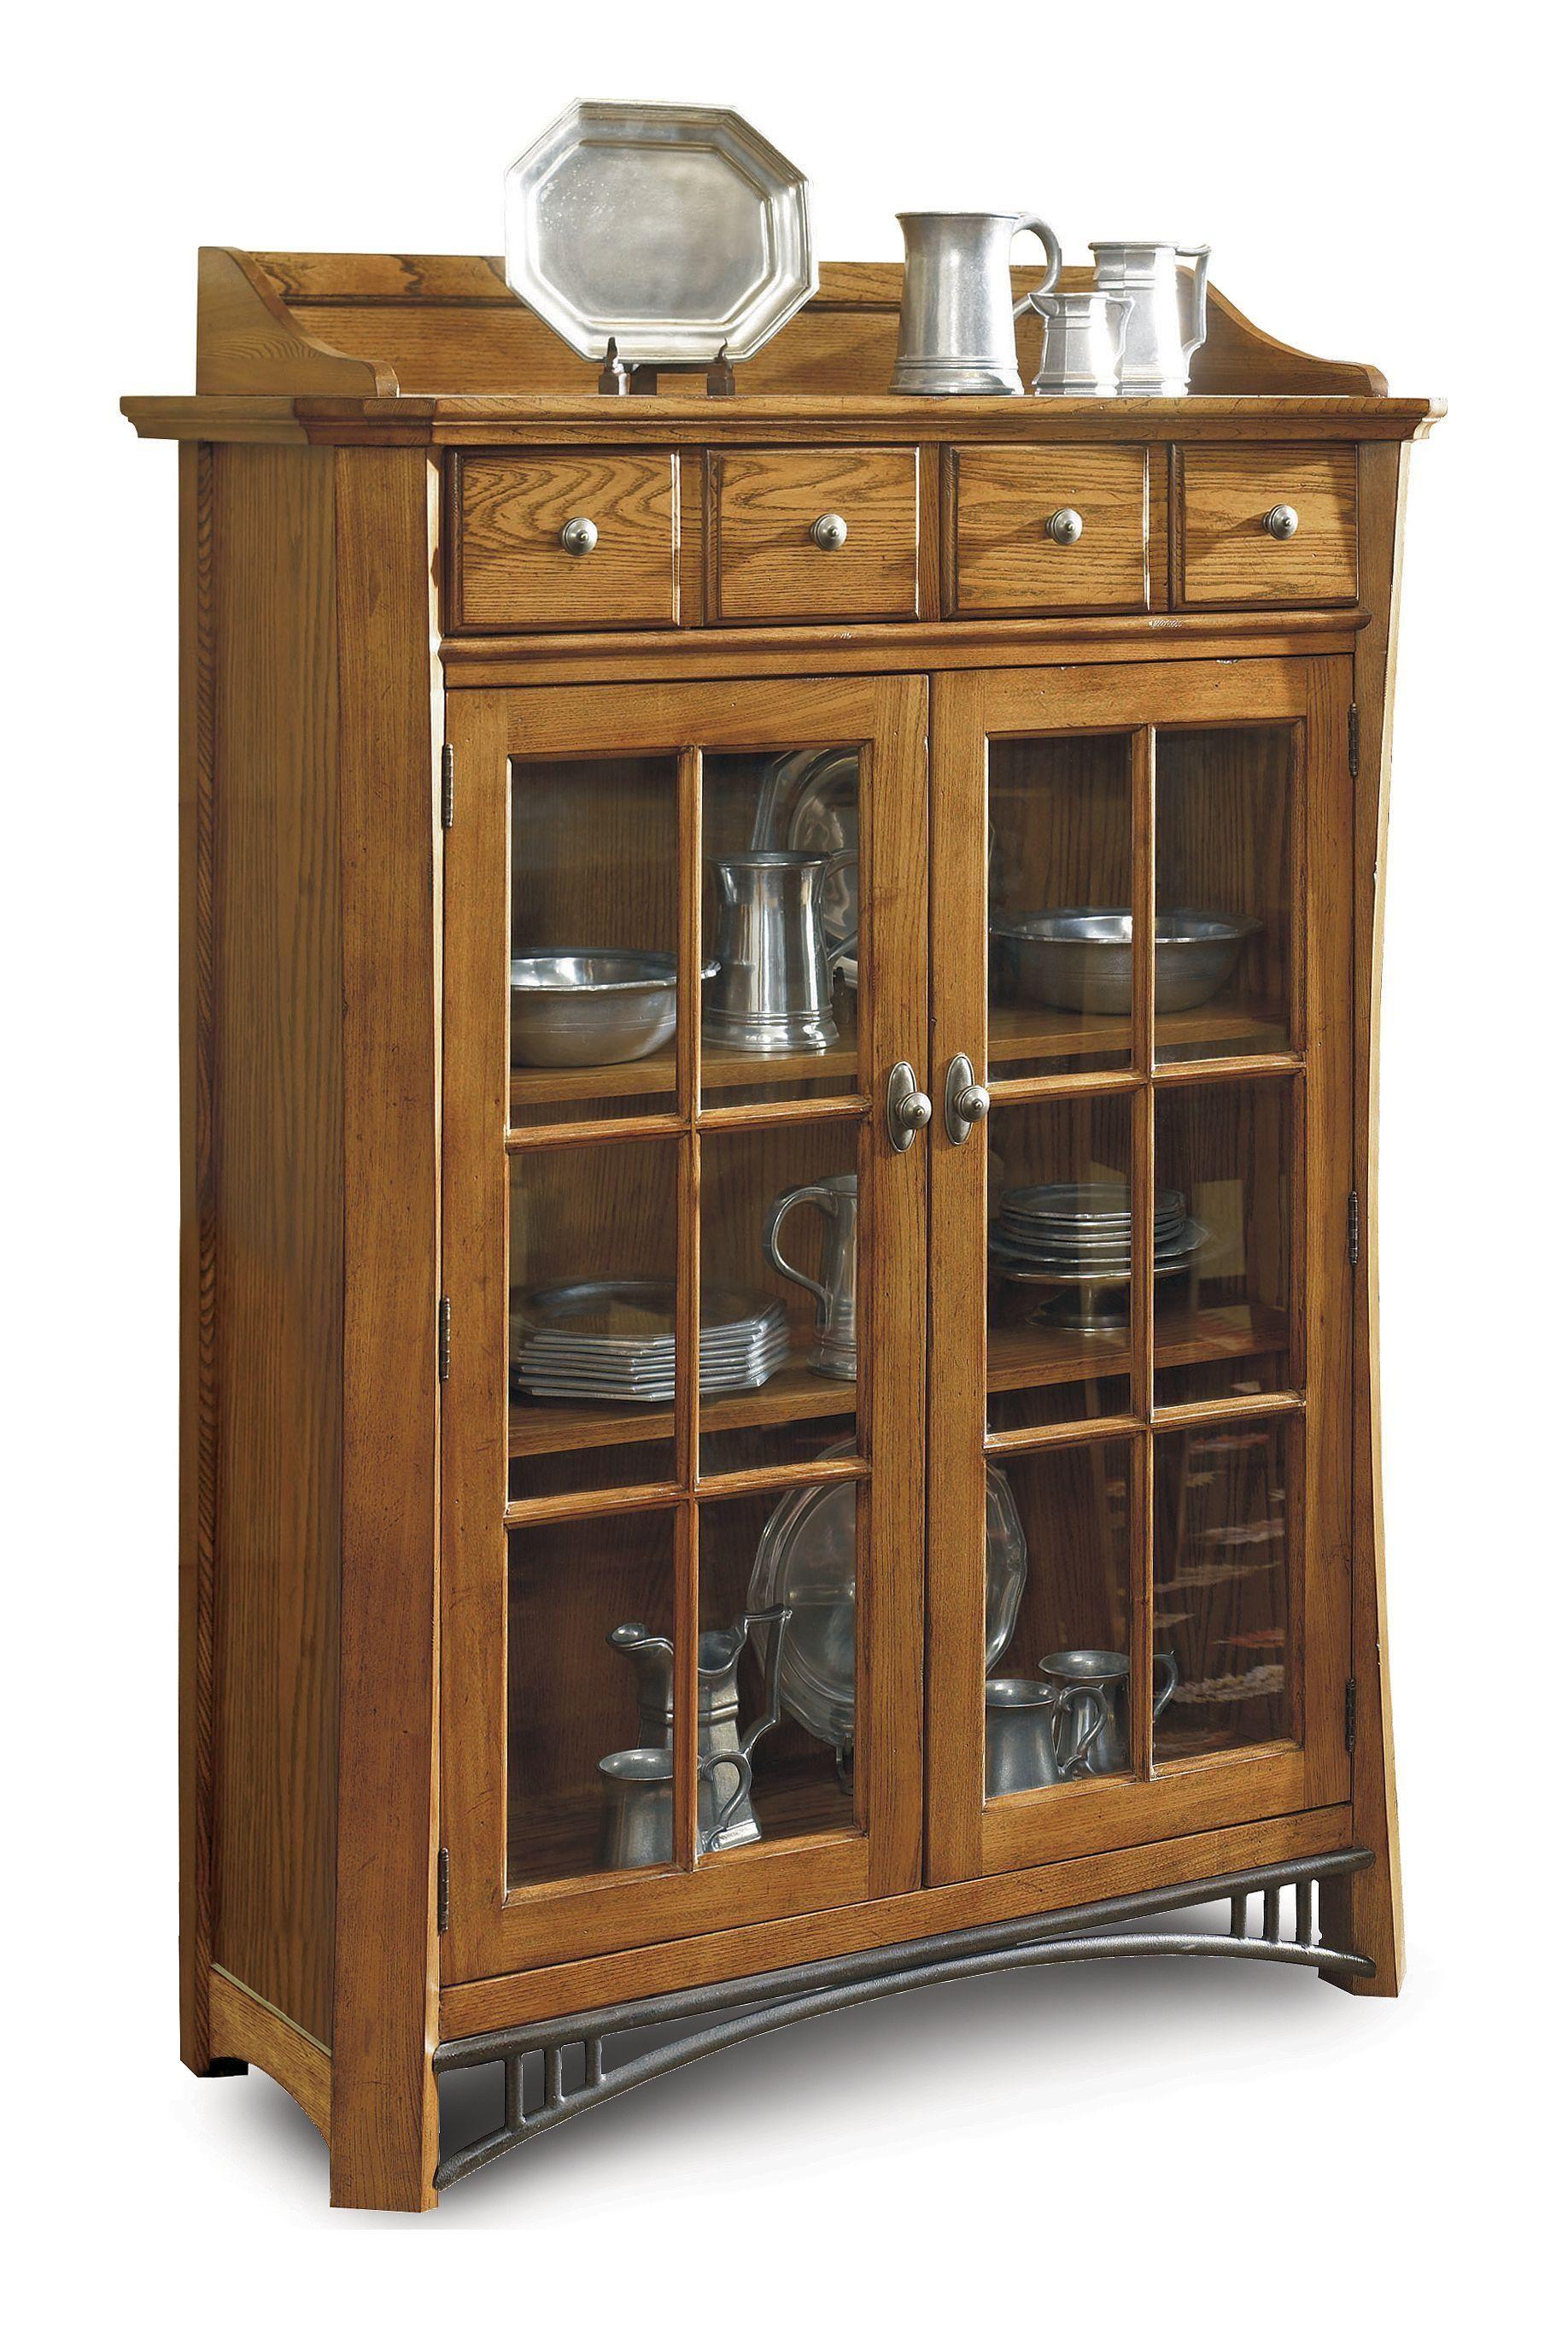 Breckenridge Display Cabinet Adjustable Shelving Cabinet Home